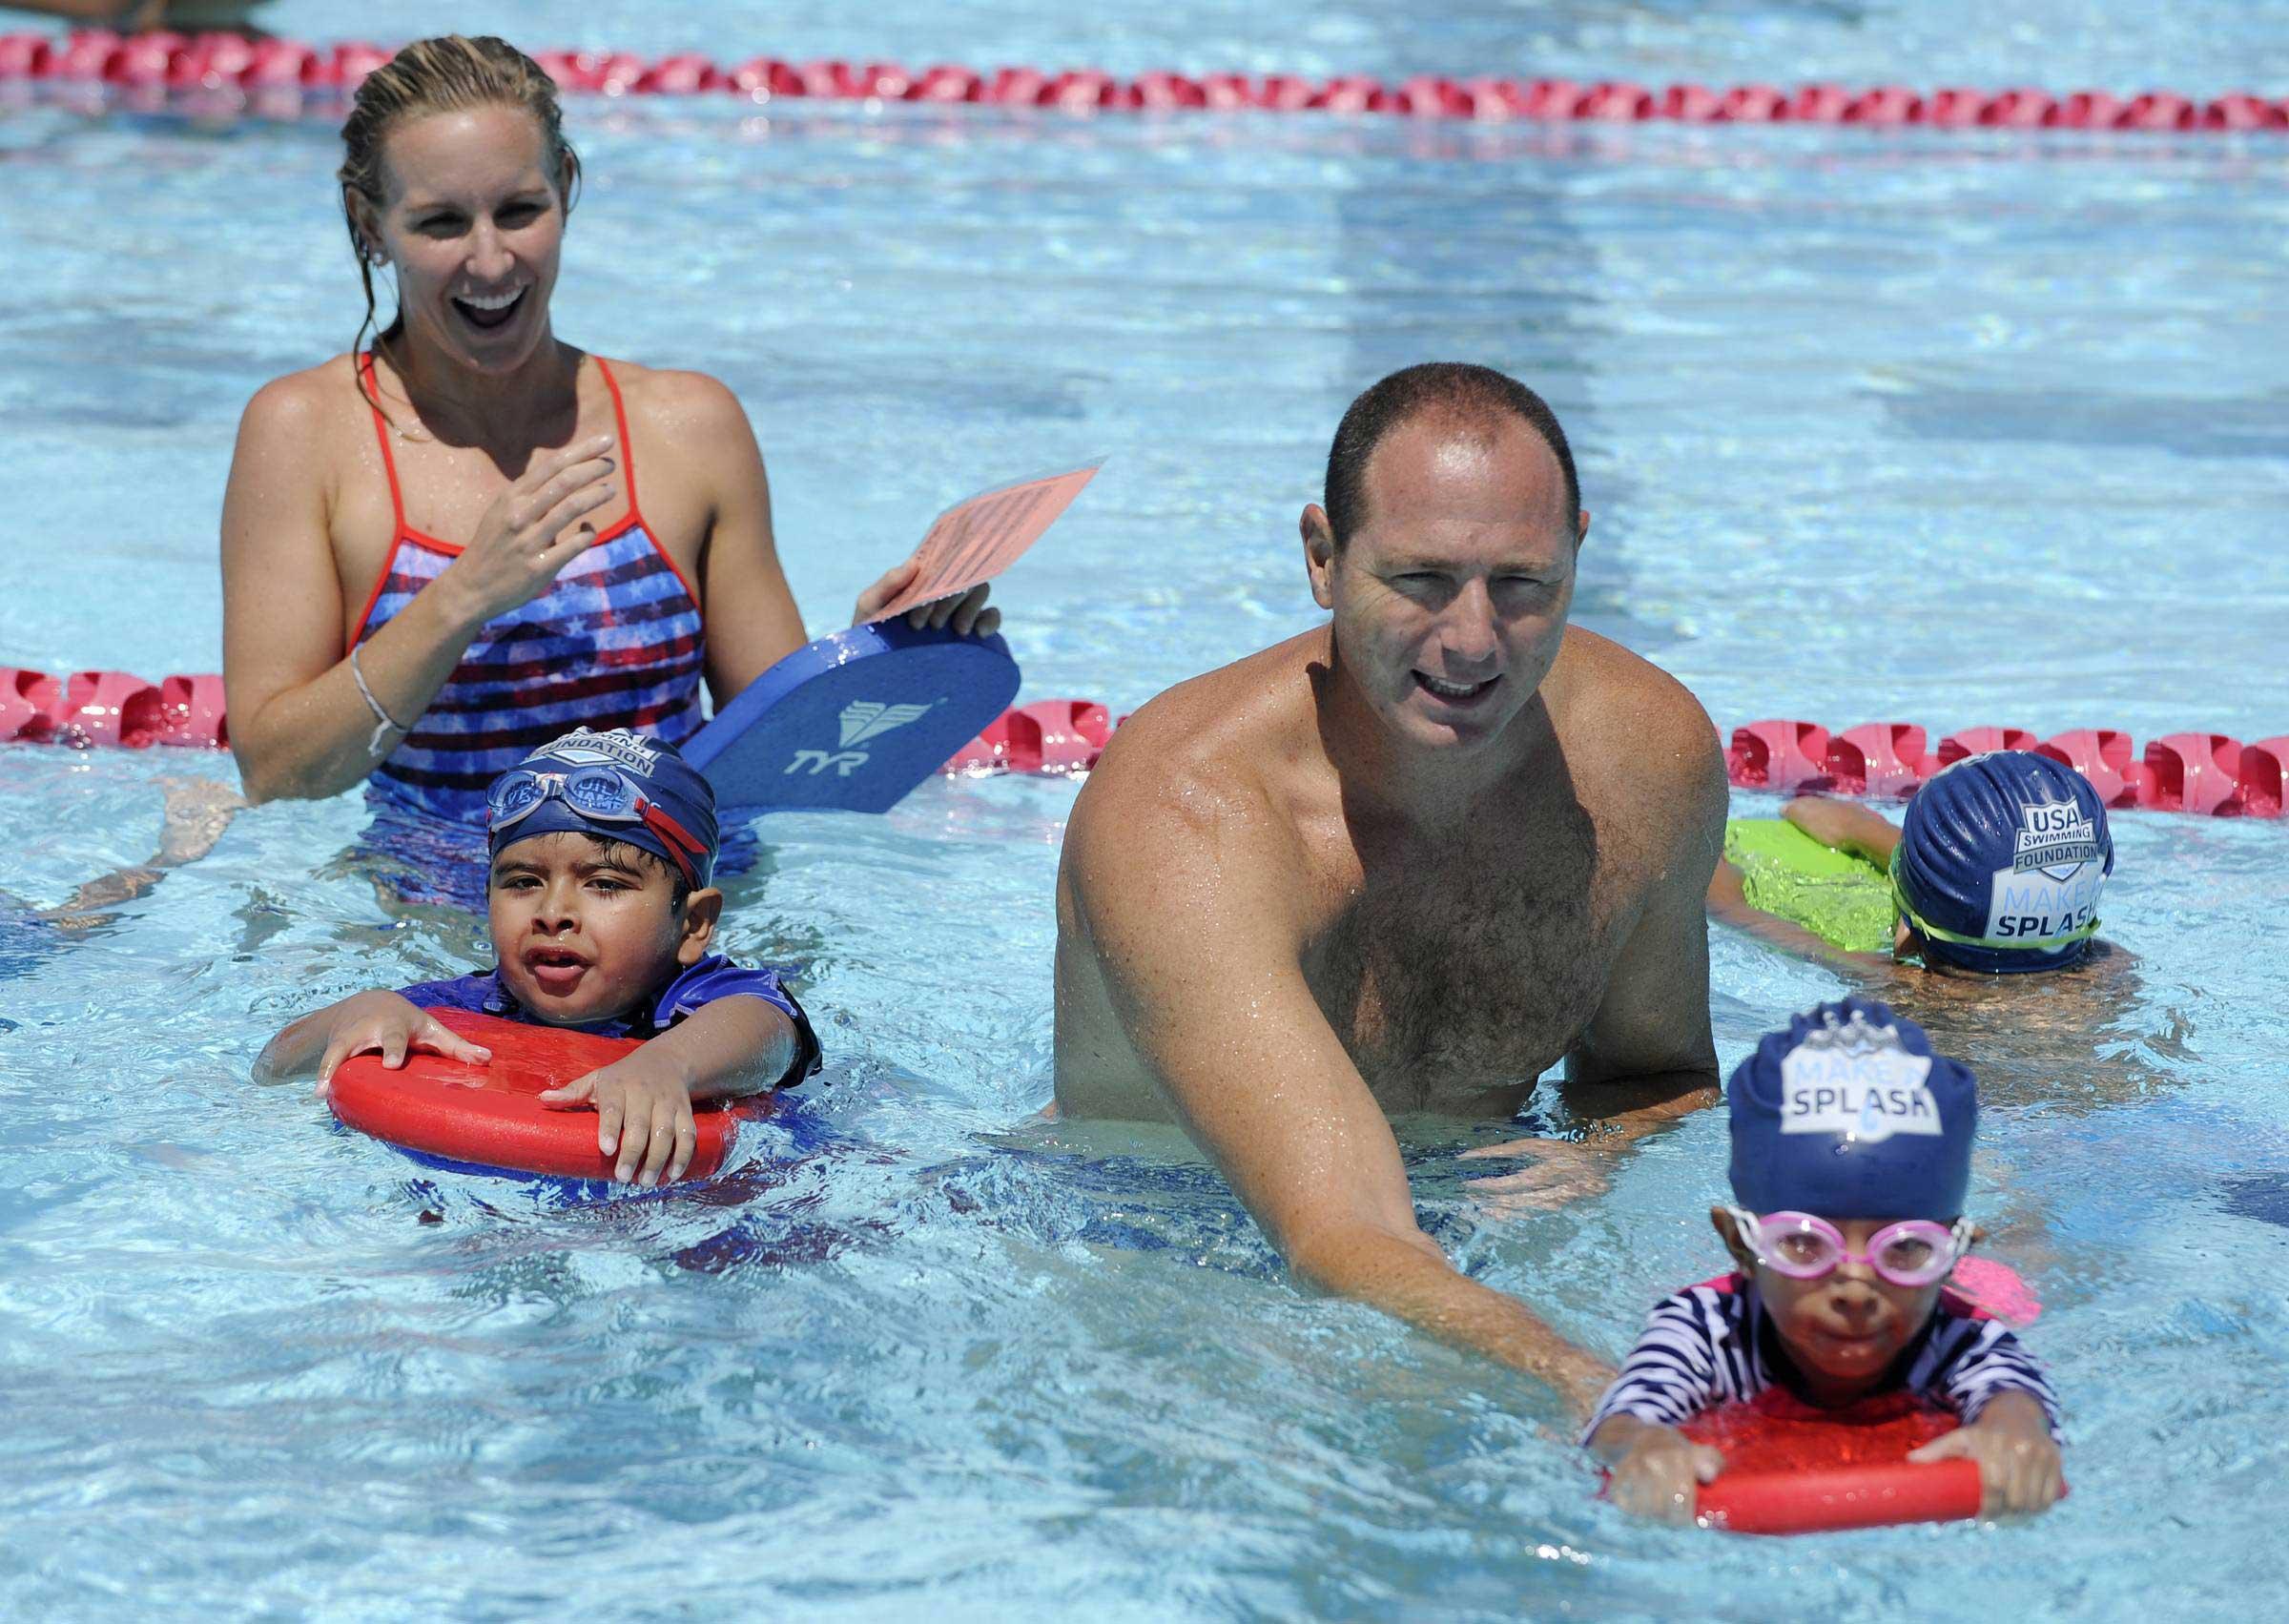 August 2, 2016, Long Beach, CA. Pre-school children participate in USA Swimming Foundation's first ever Make a Splash Games event.